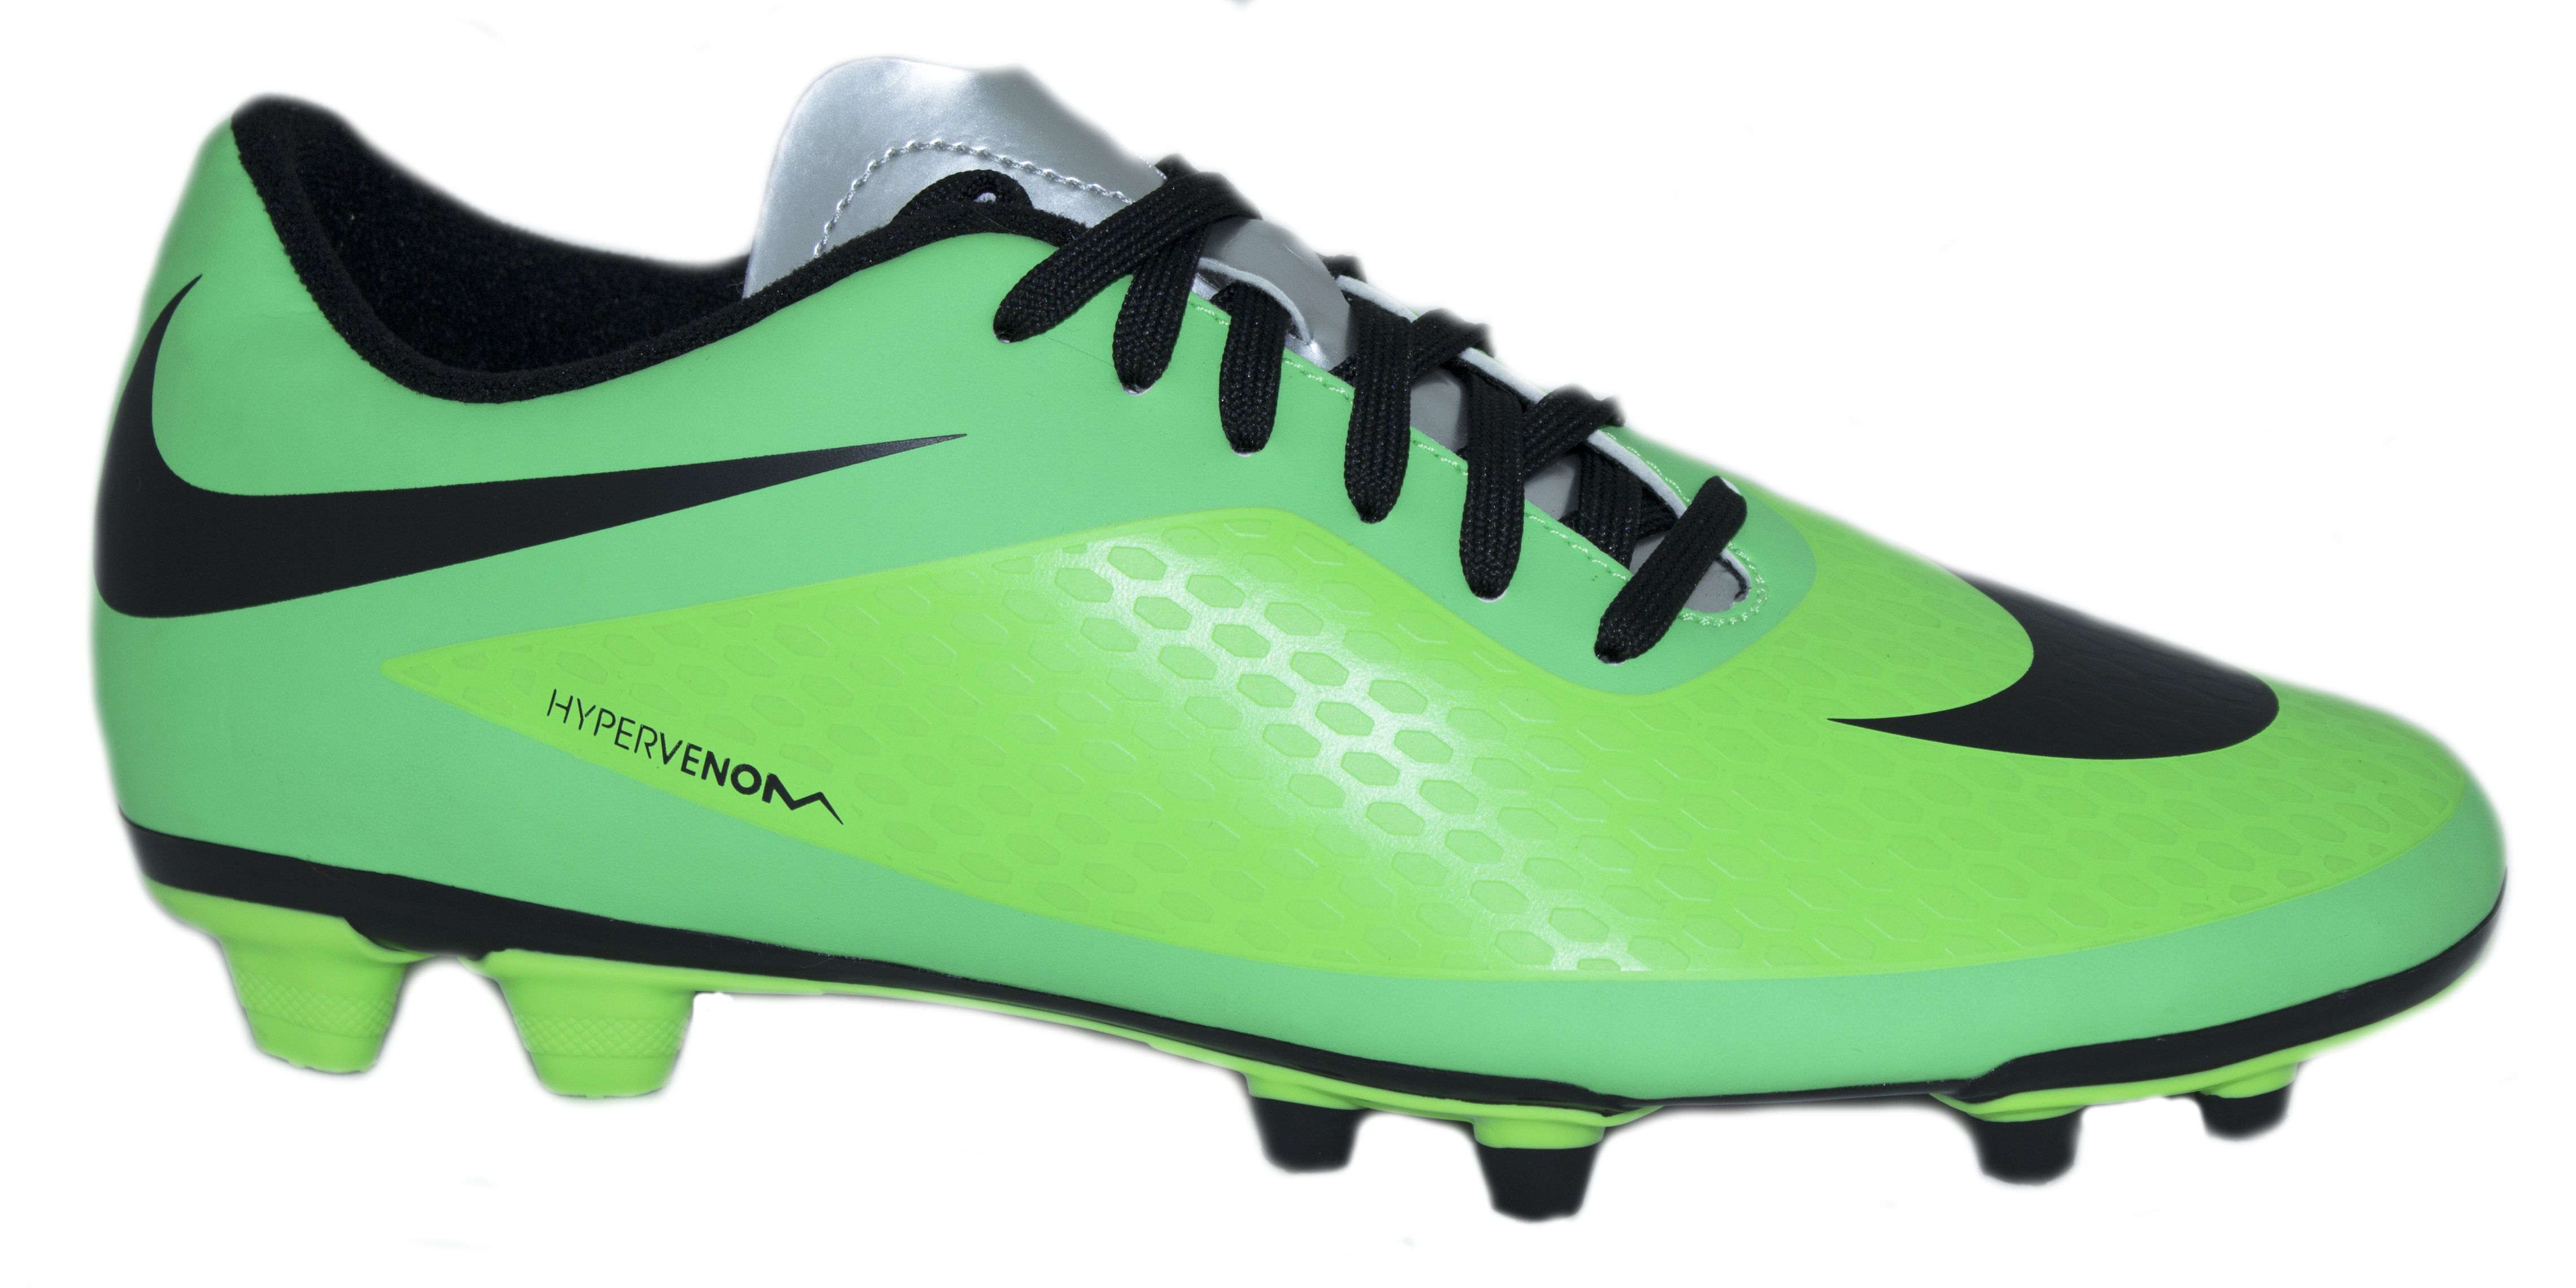 COMPRA ONLINE  WWW.IMPERIALSHOP.CO Guayos Nike Hypervenom Phade FG ... ae26a5a9cdeae